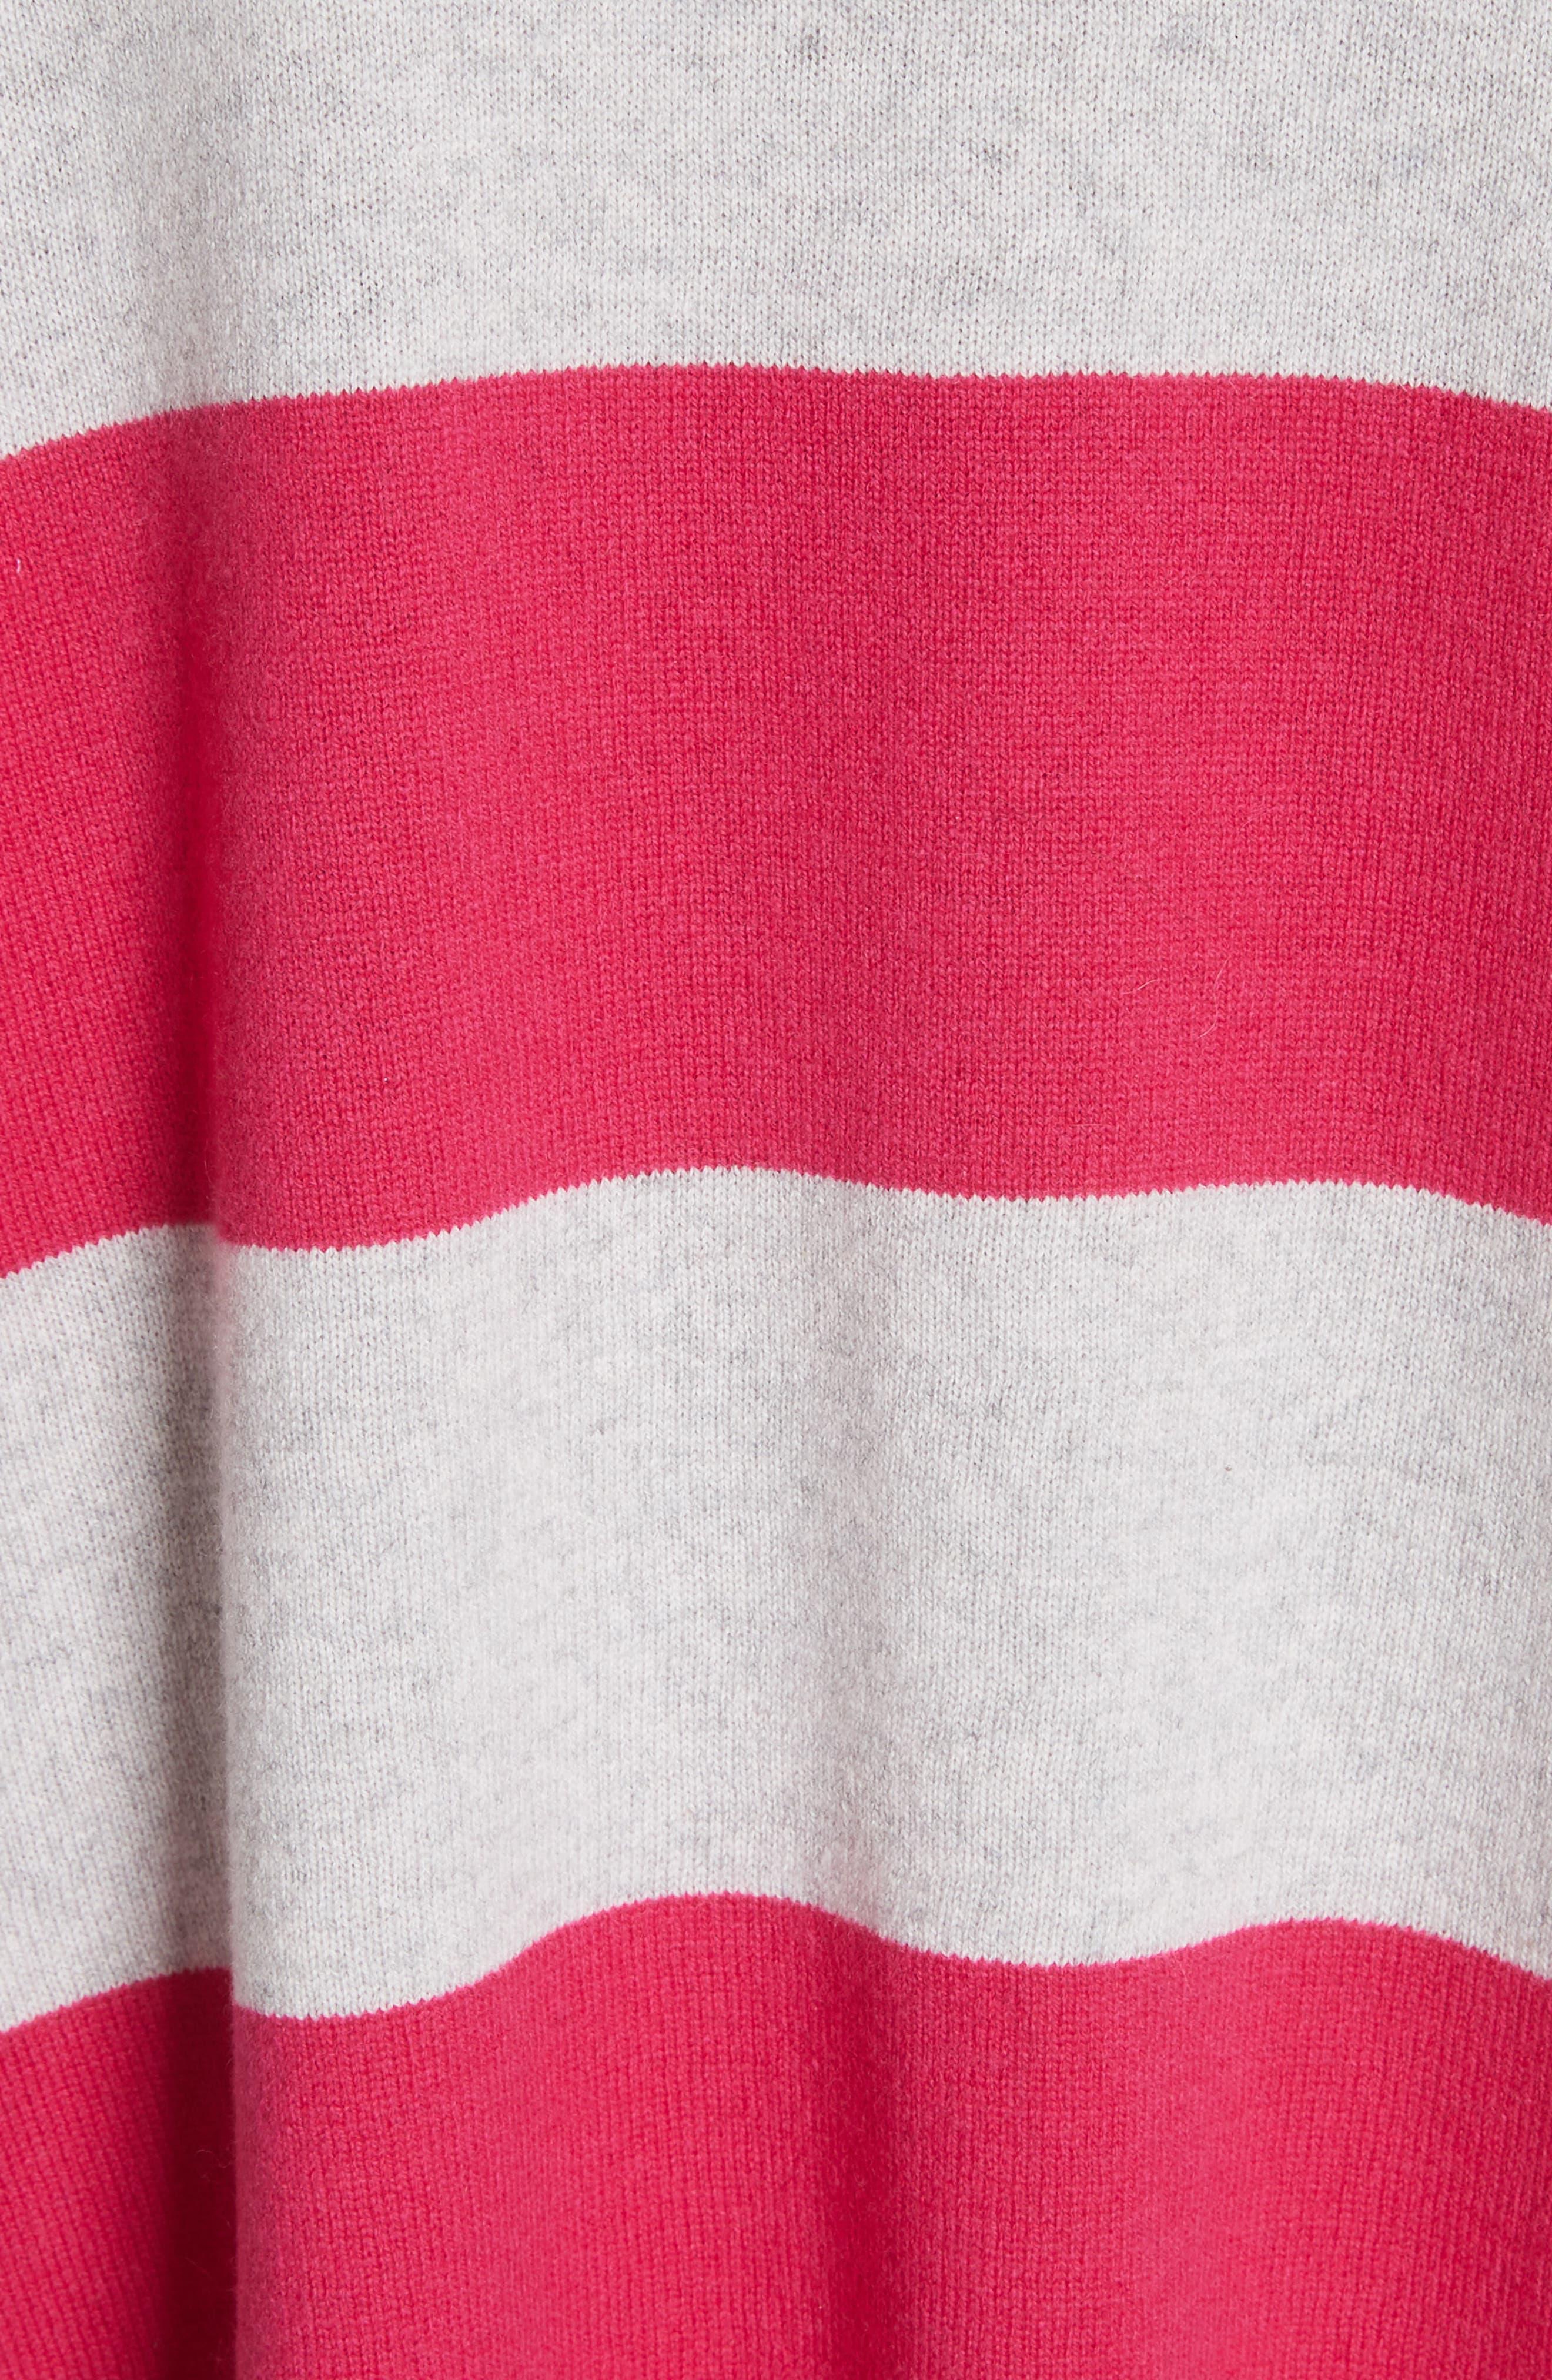 Inghin Stripe Wool & Cashmere Sweater,                             Alternate thumbnail 5, color,                             Hacienda/ Heather Grey